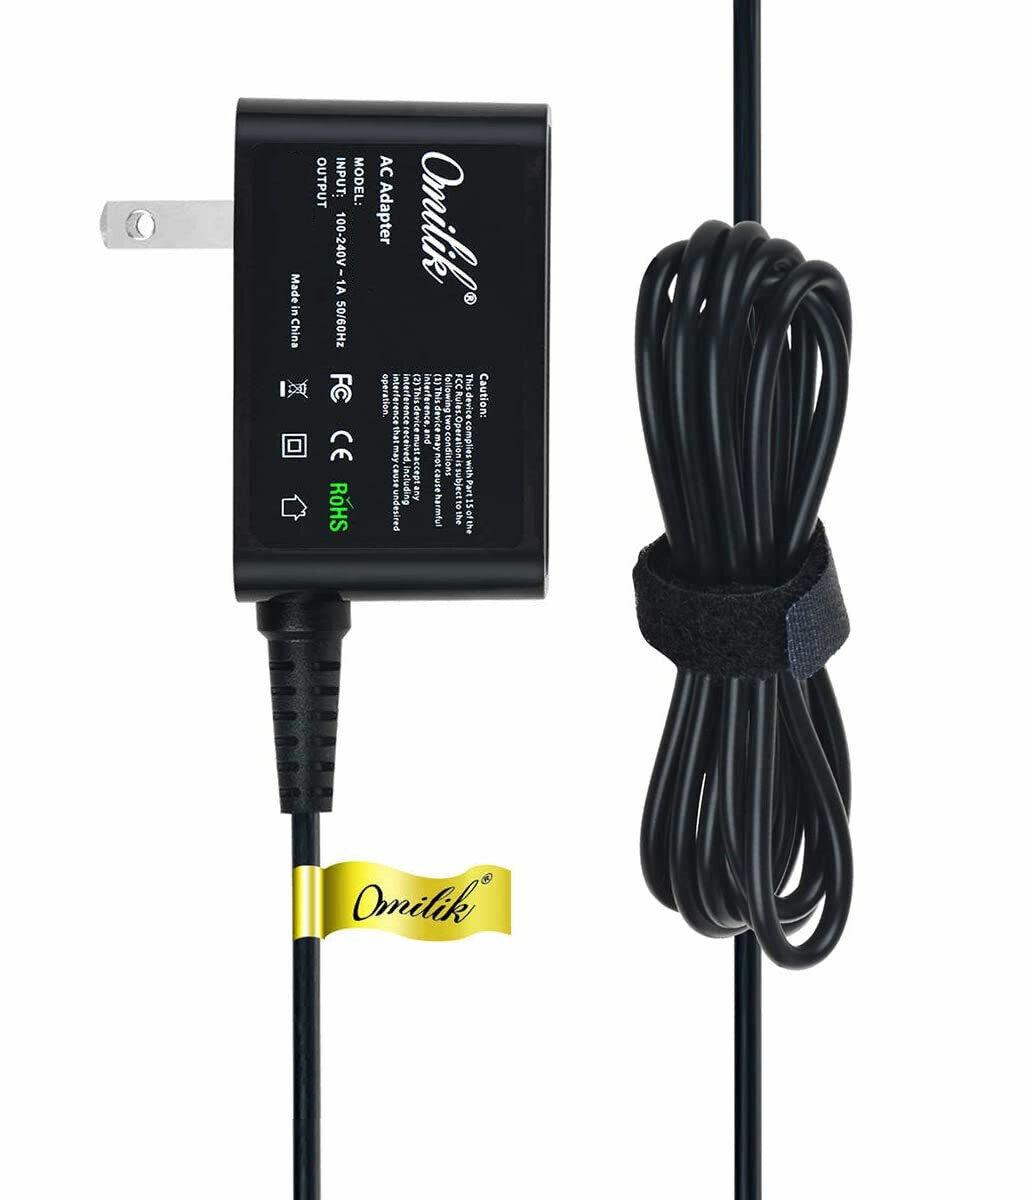 OmiLik 9V 1A DC Adapter for VTECH VSMILE TV LEARNING SYSTEM Power Cord Charger